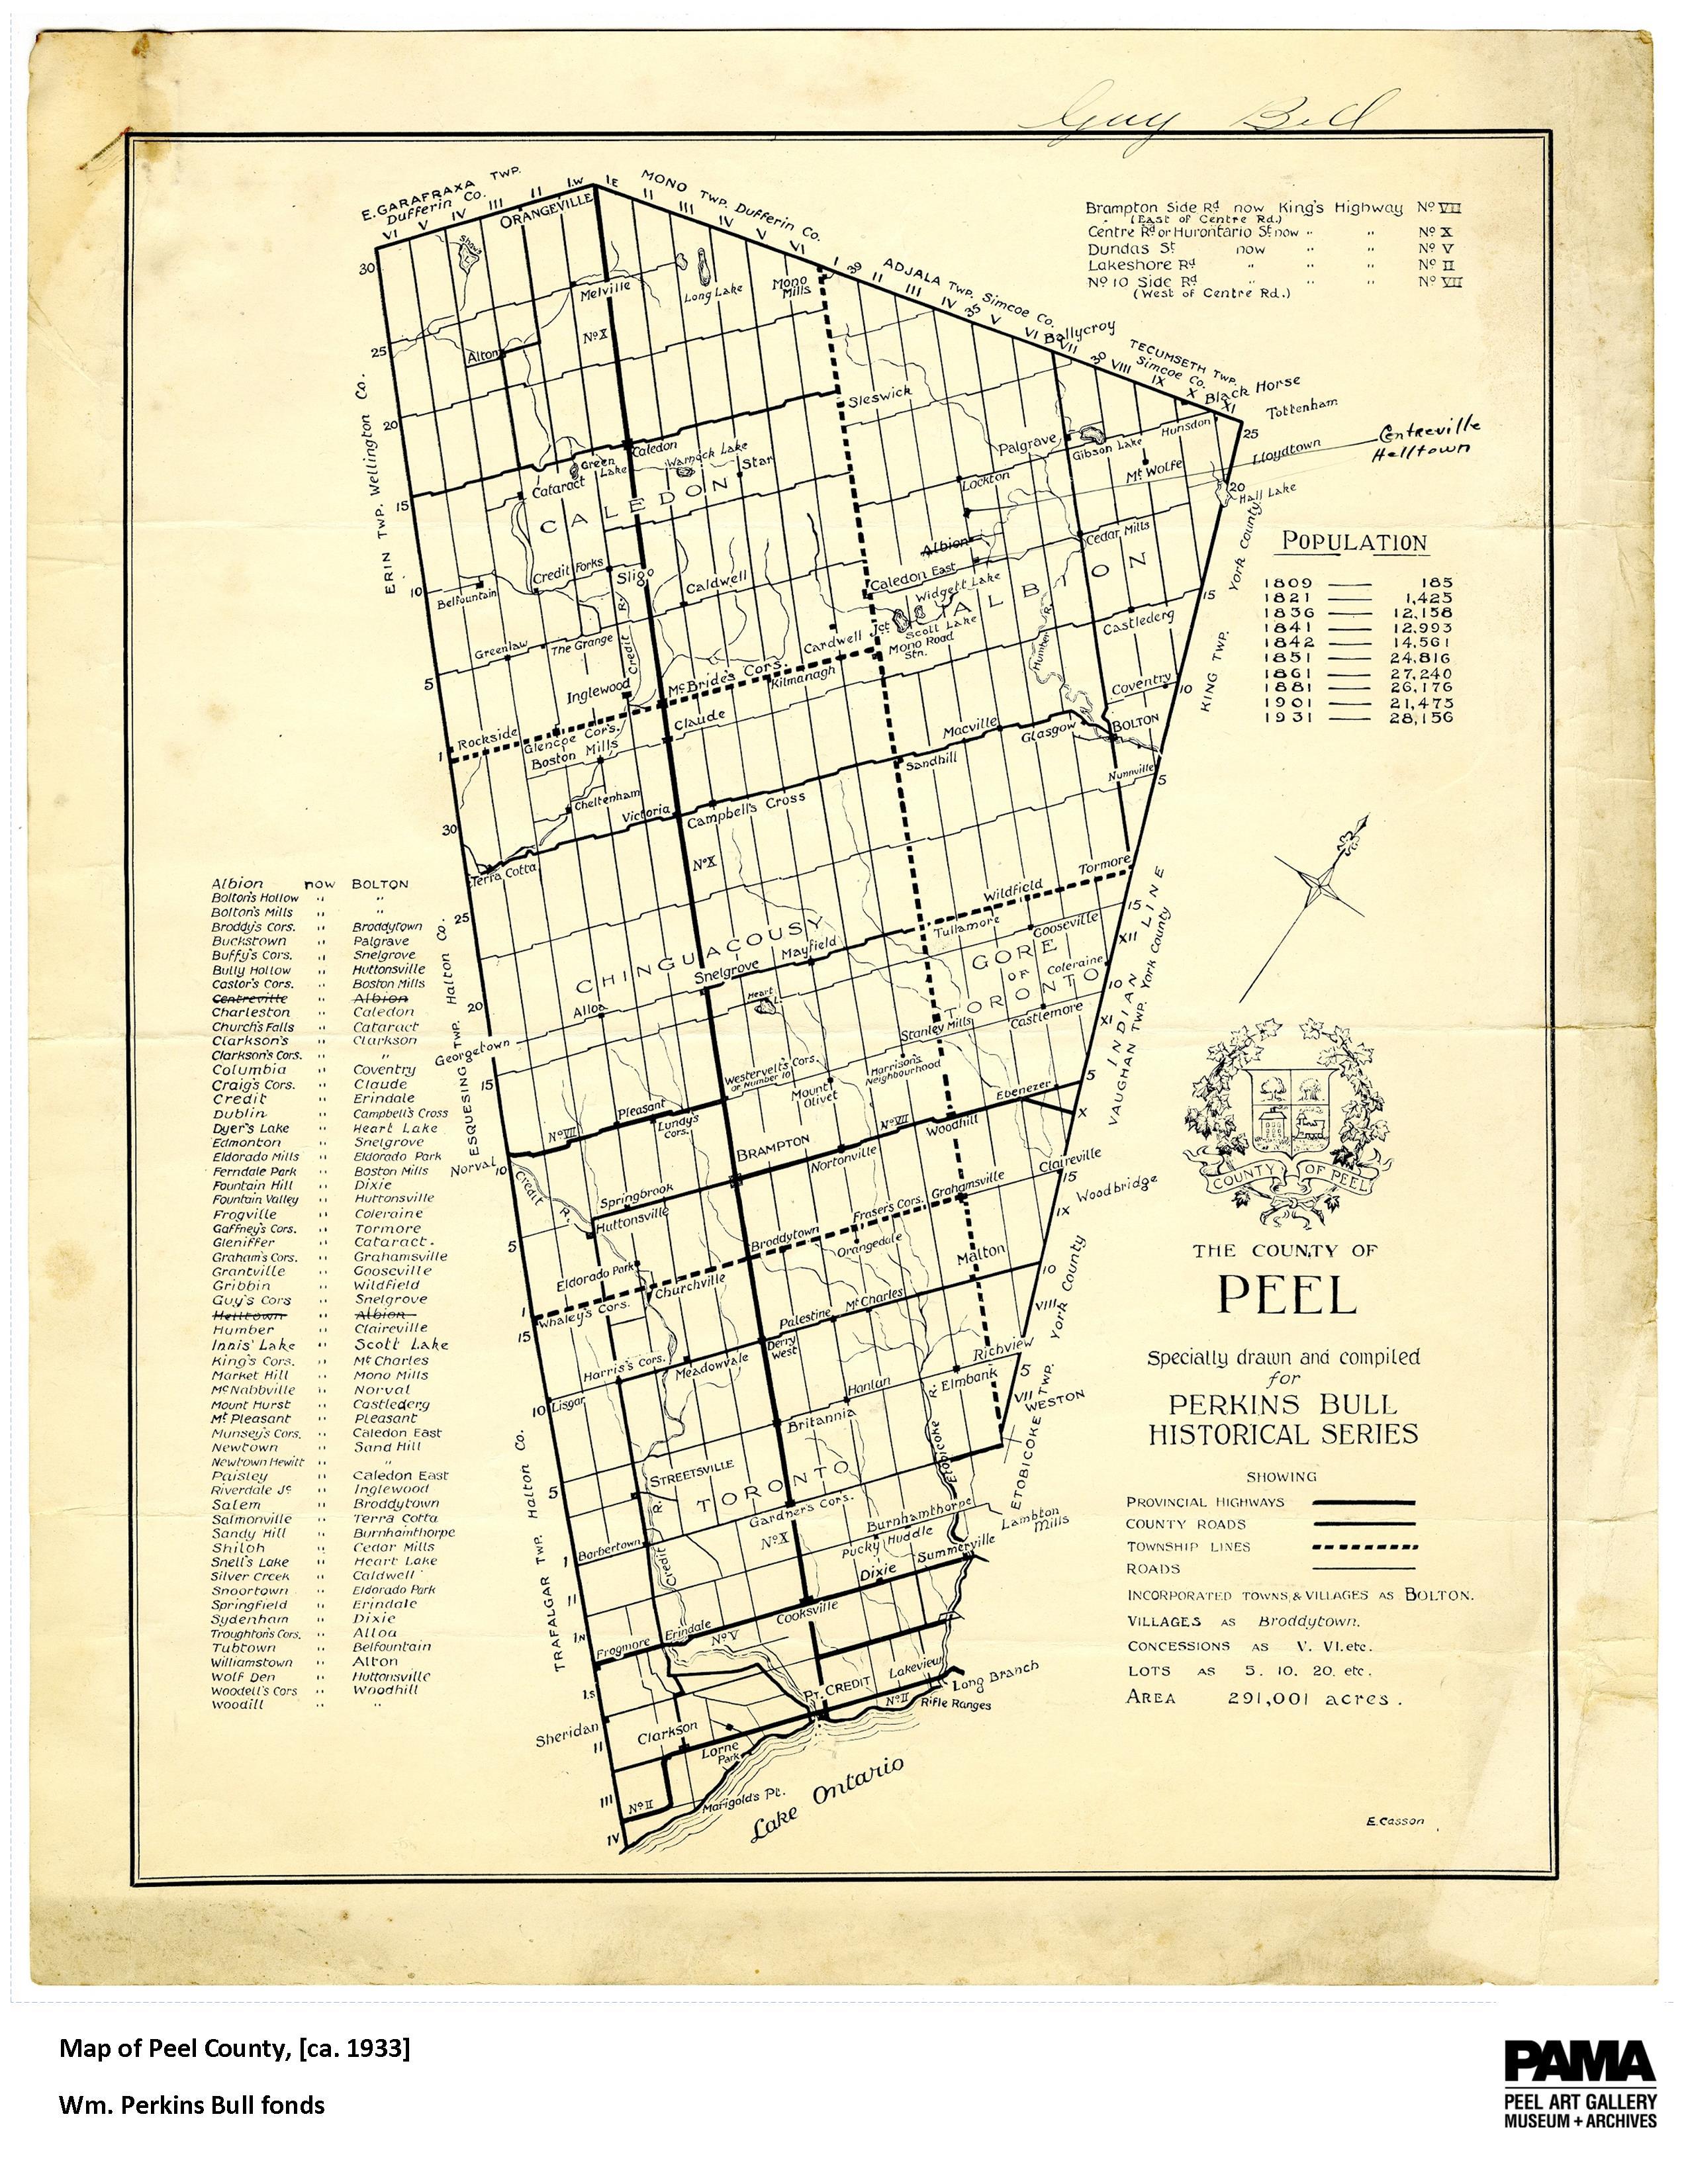 Map of Peel County, ca. 1933 (WP Bull fonds)